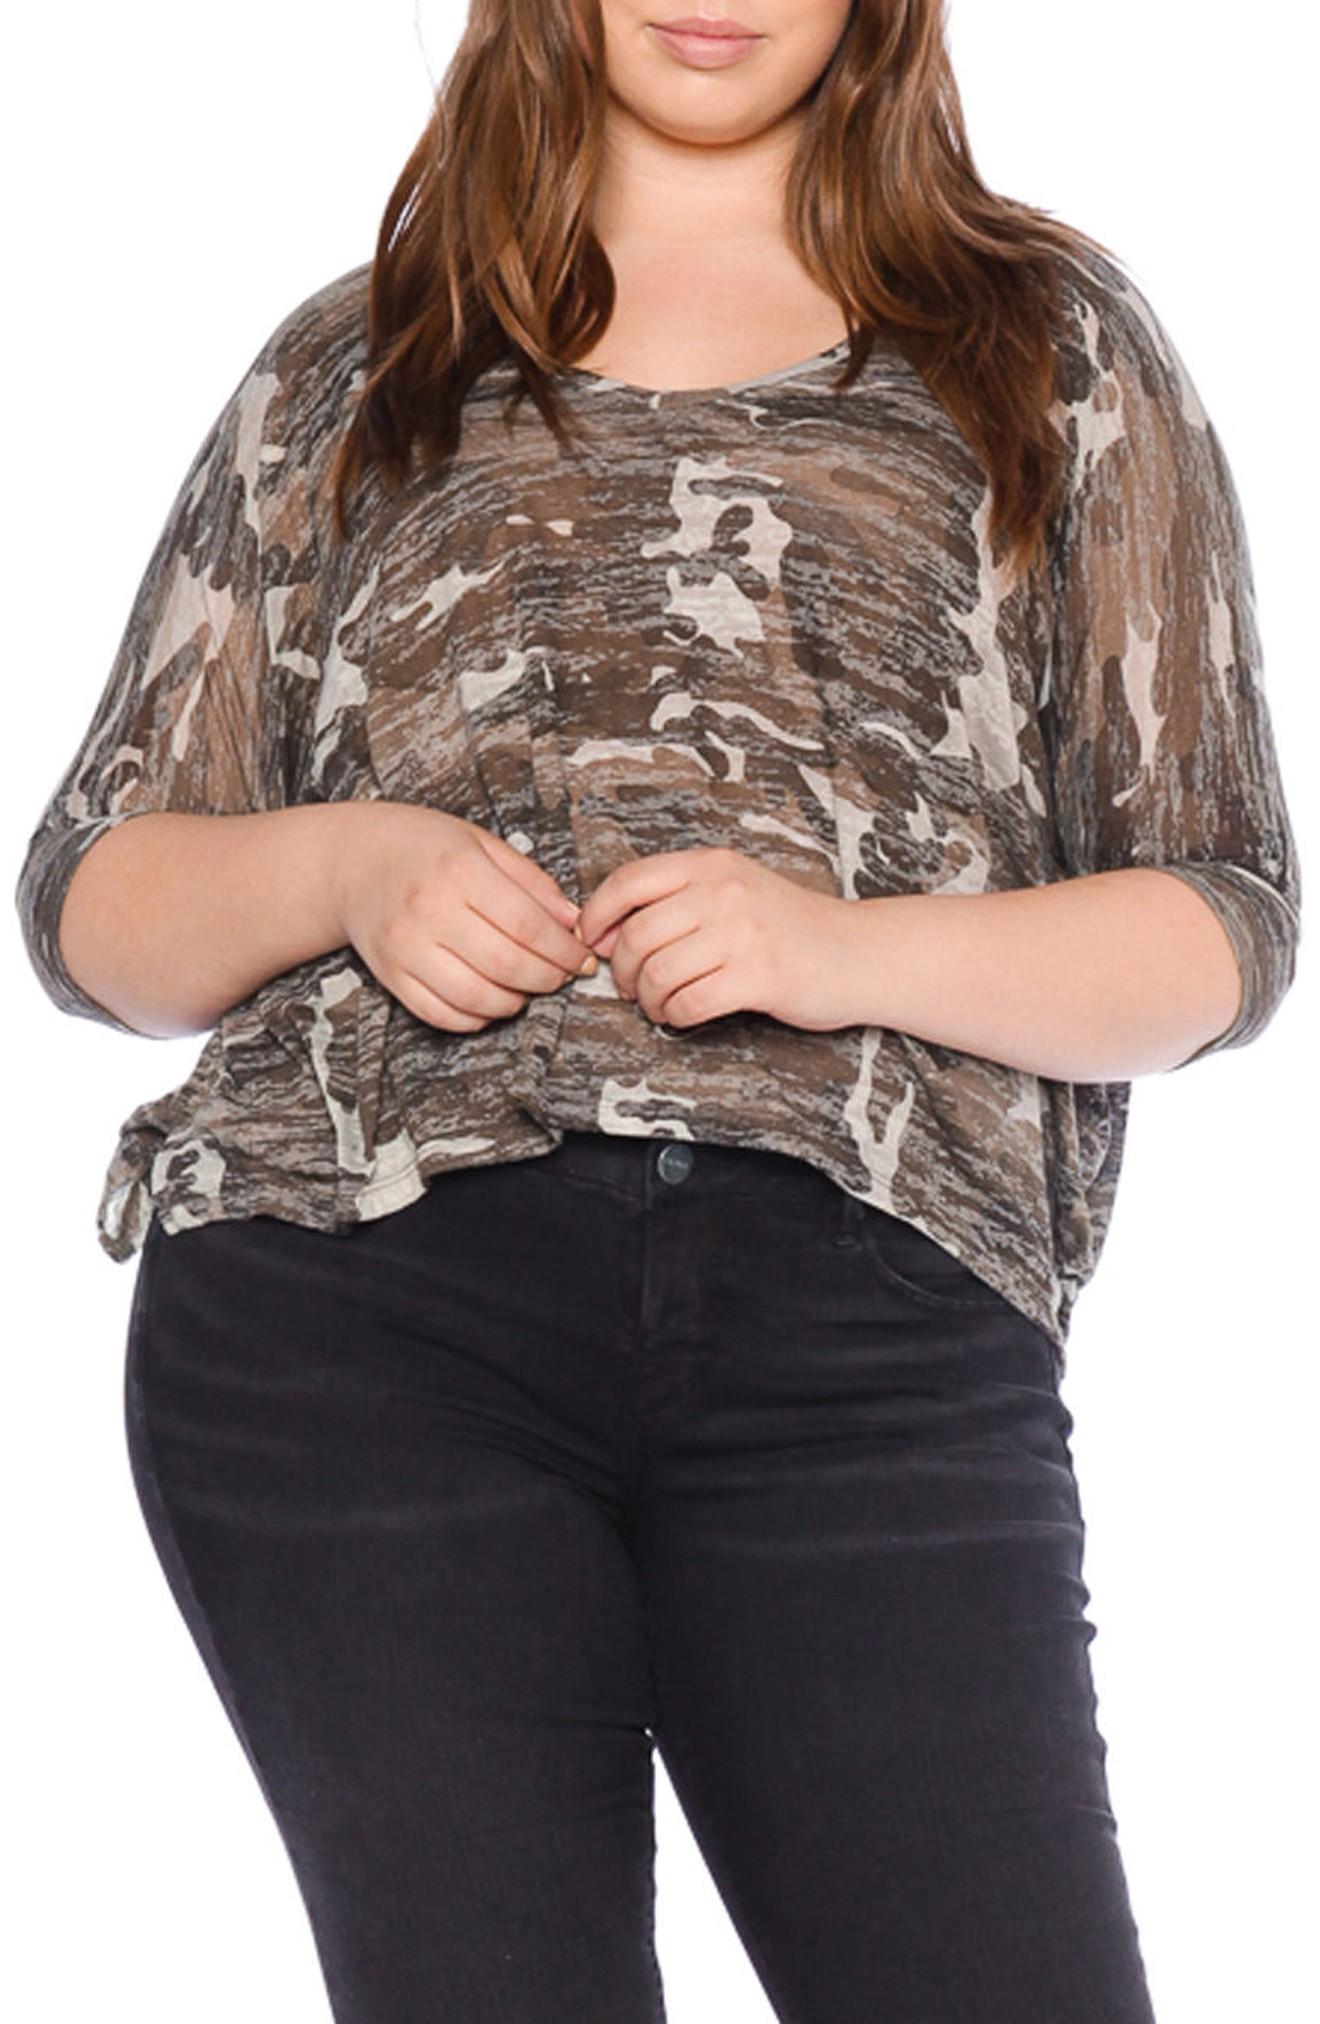 Slink Jeans Camo Print Shirt In Burnout Camo